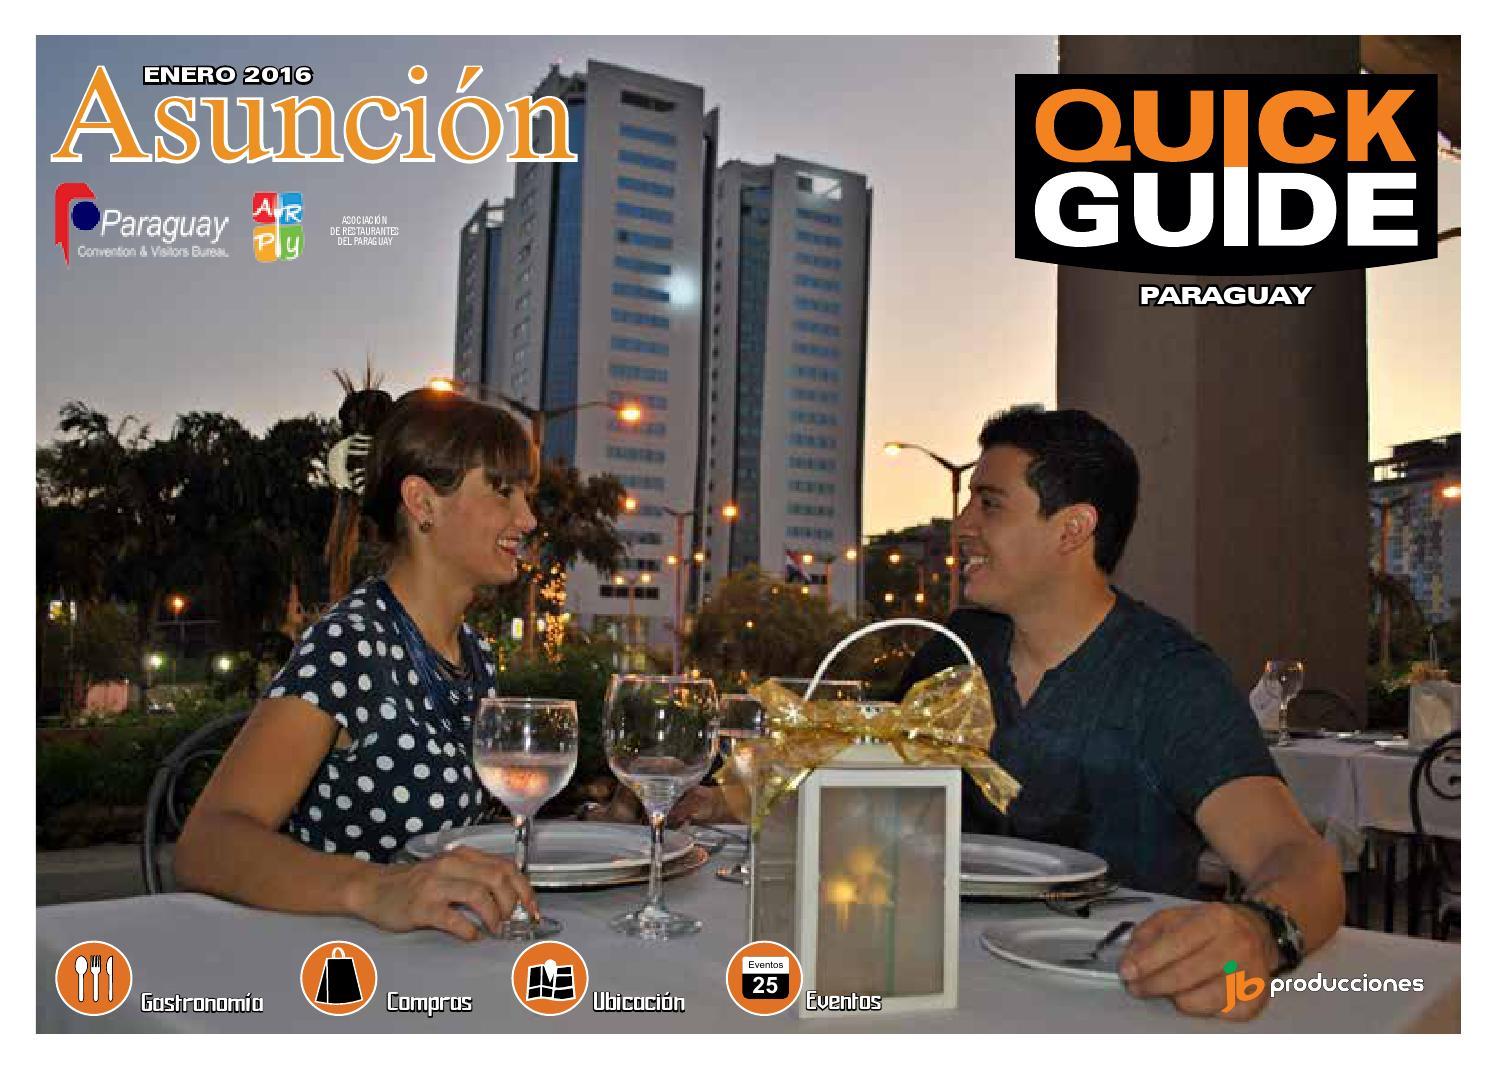 Quick Guide Asunci N Paraguay Tour Itapua Edici N Enero  # Muebles Narciso Caaguazu